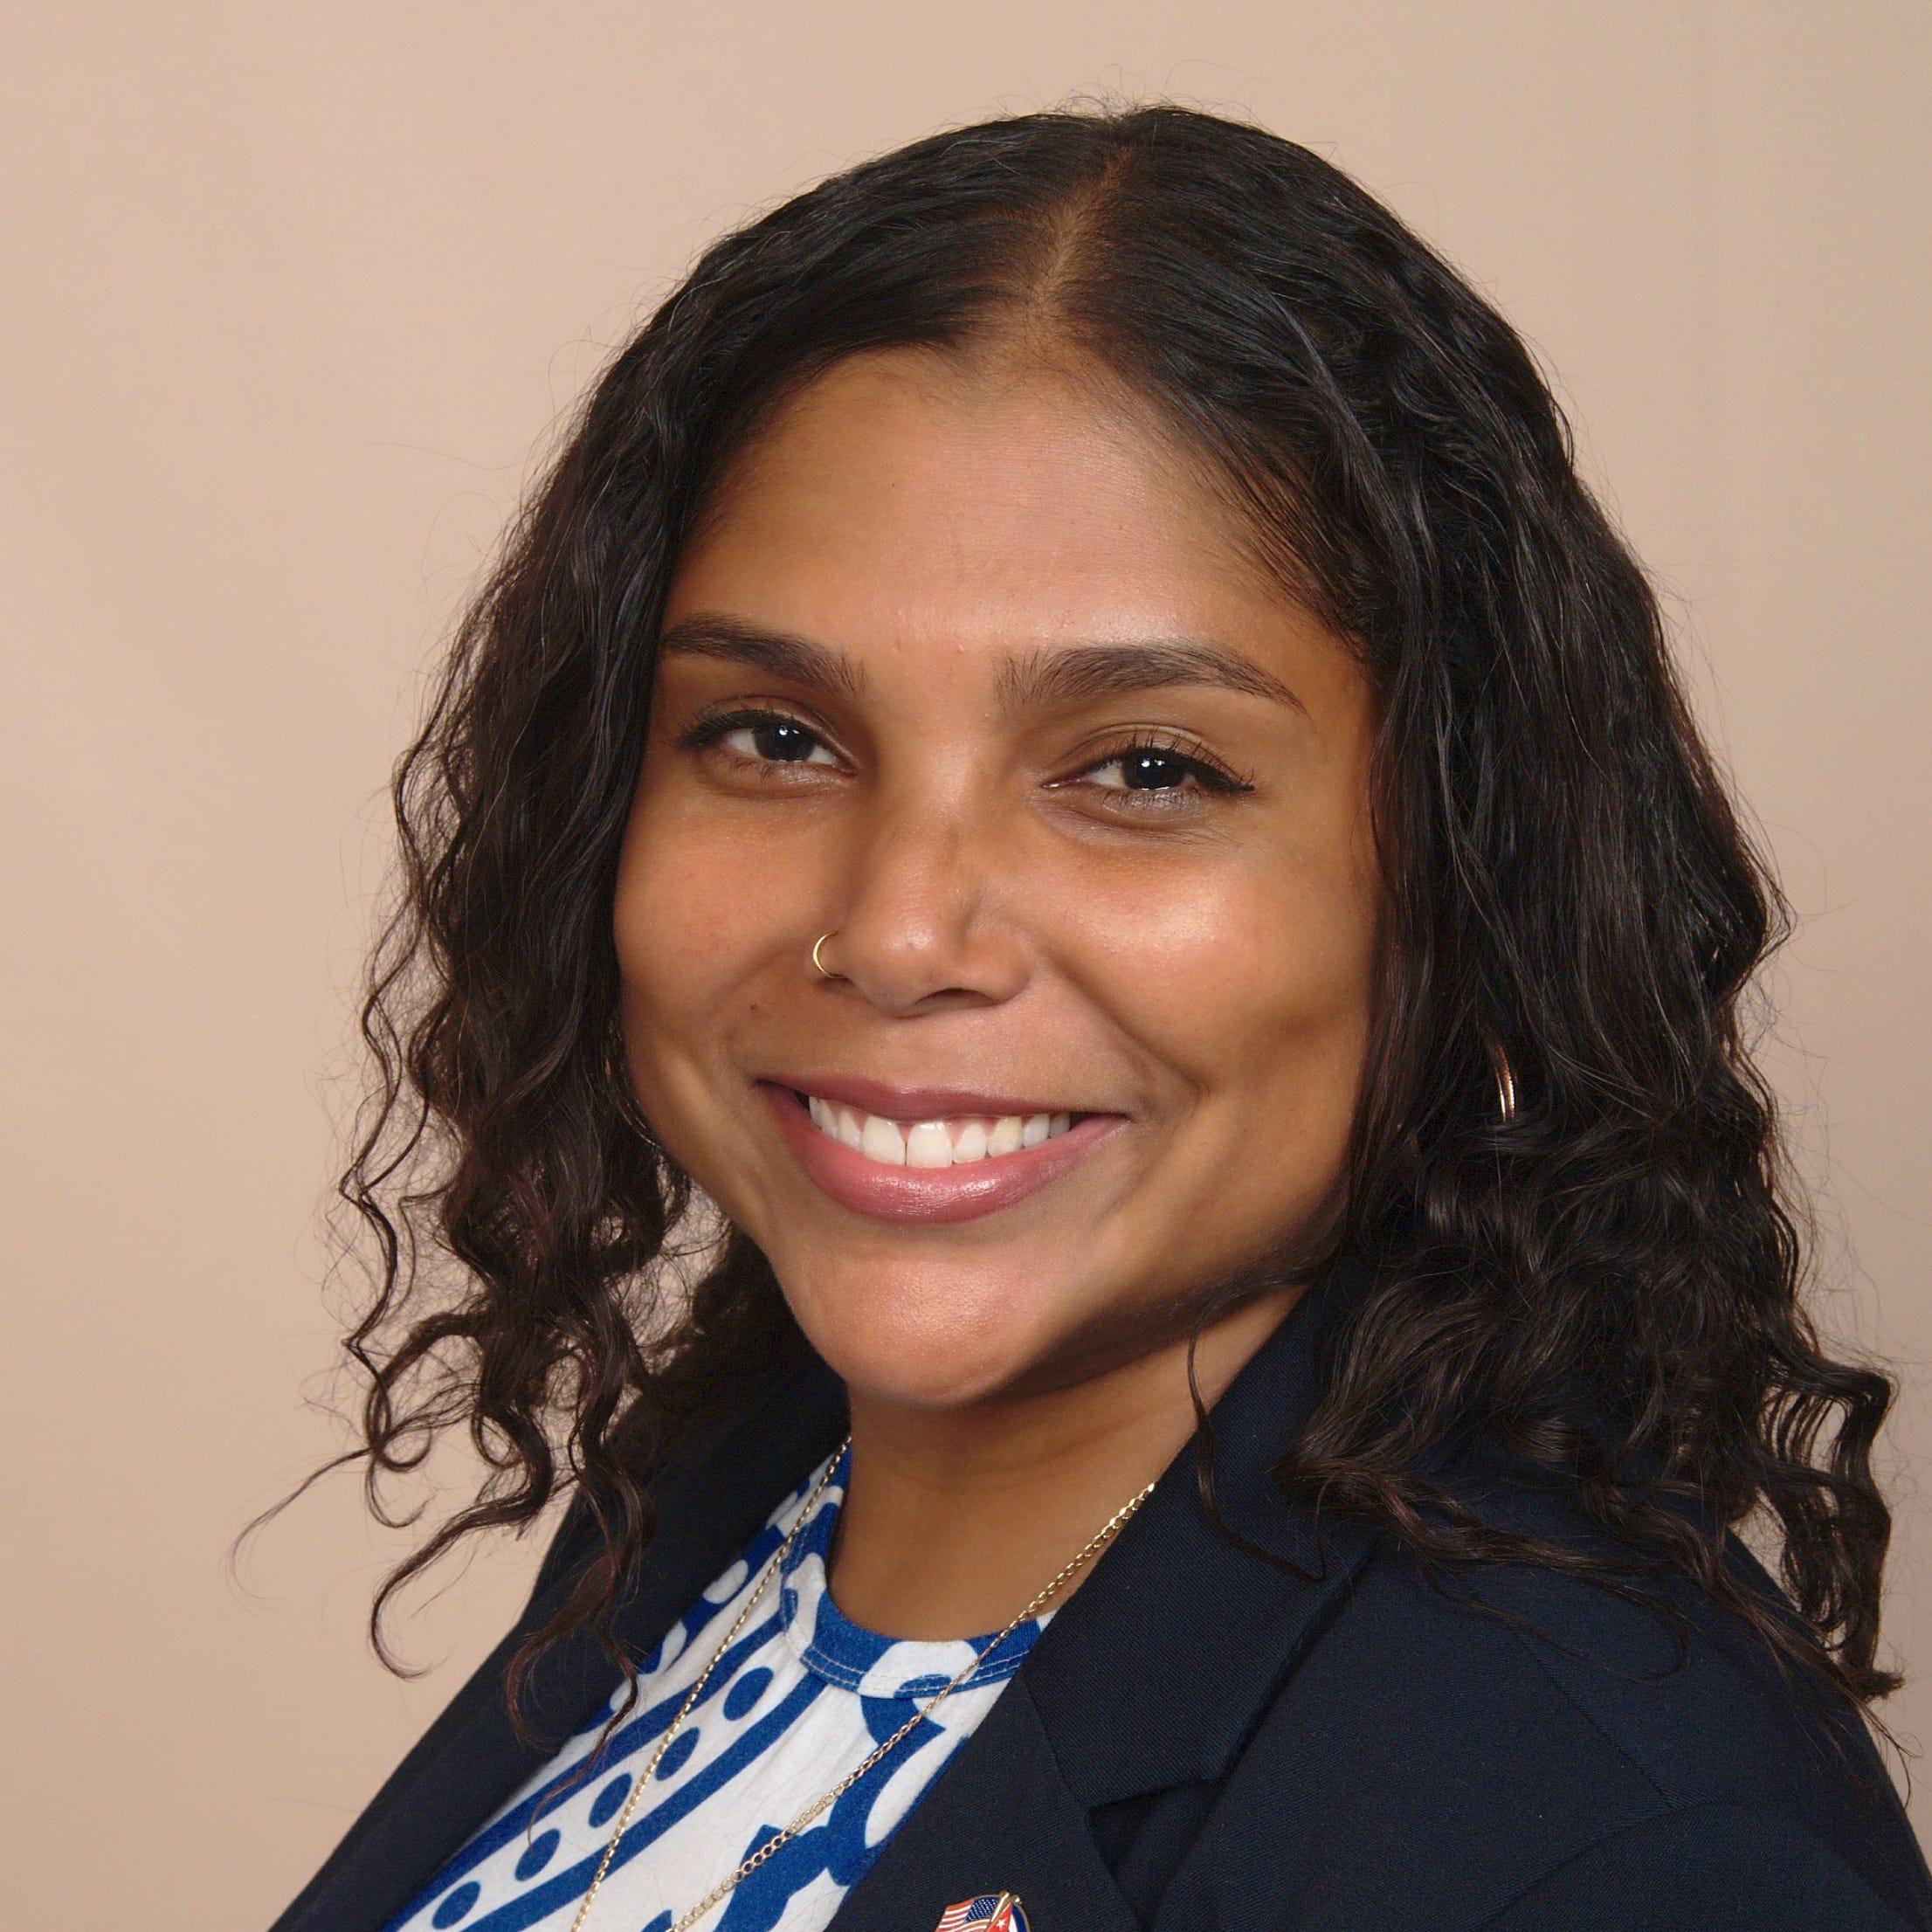 Jessica Dueñas, is a founding teacher at the W.E.B. DuBois Academy and the 2019 Kentucky State Teacher of the Year.